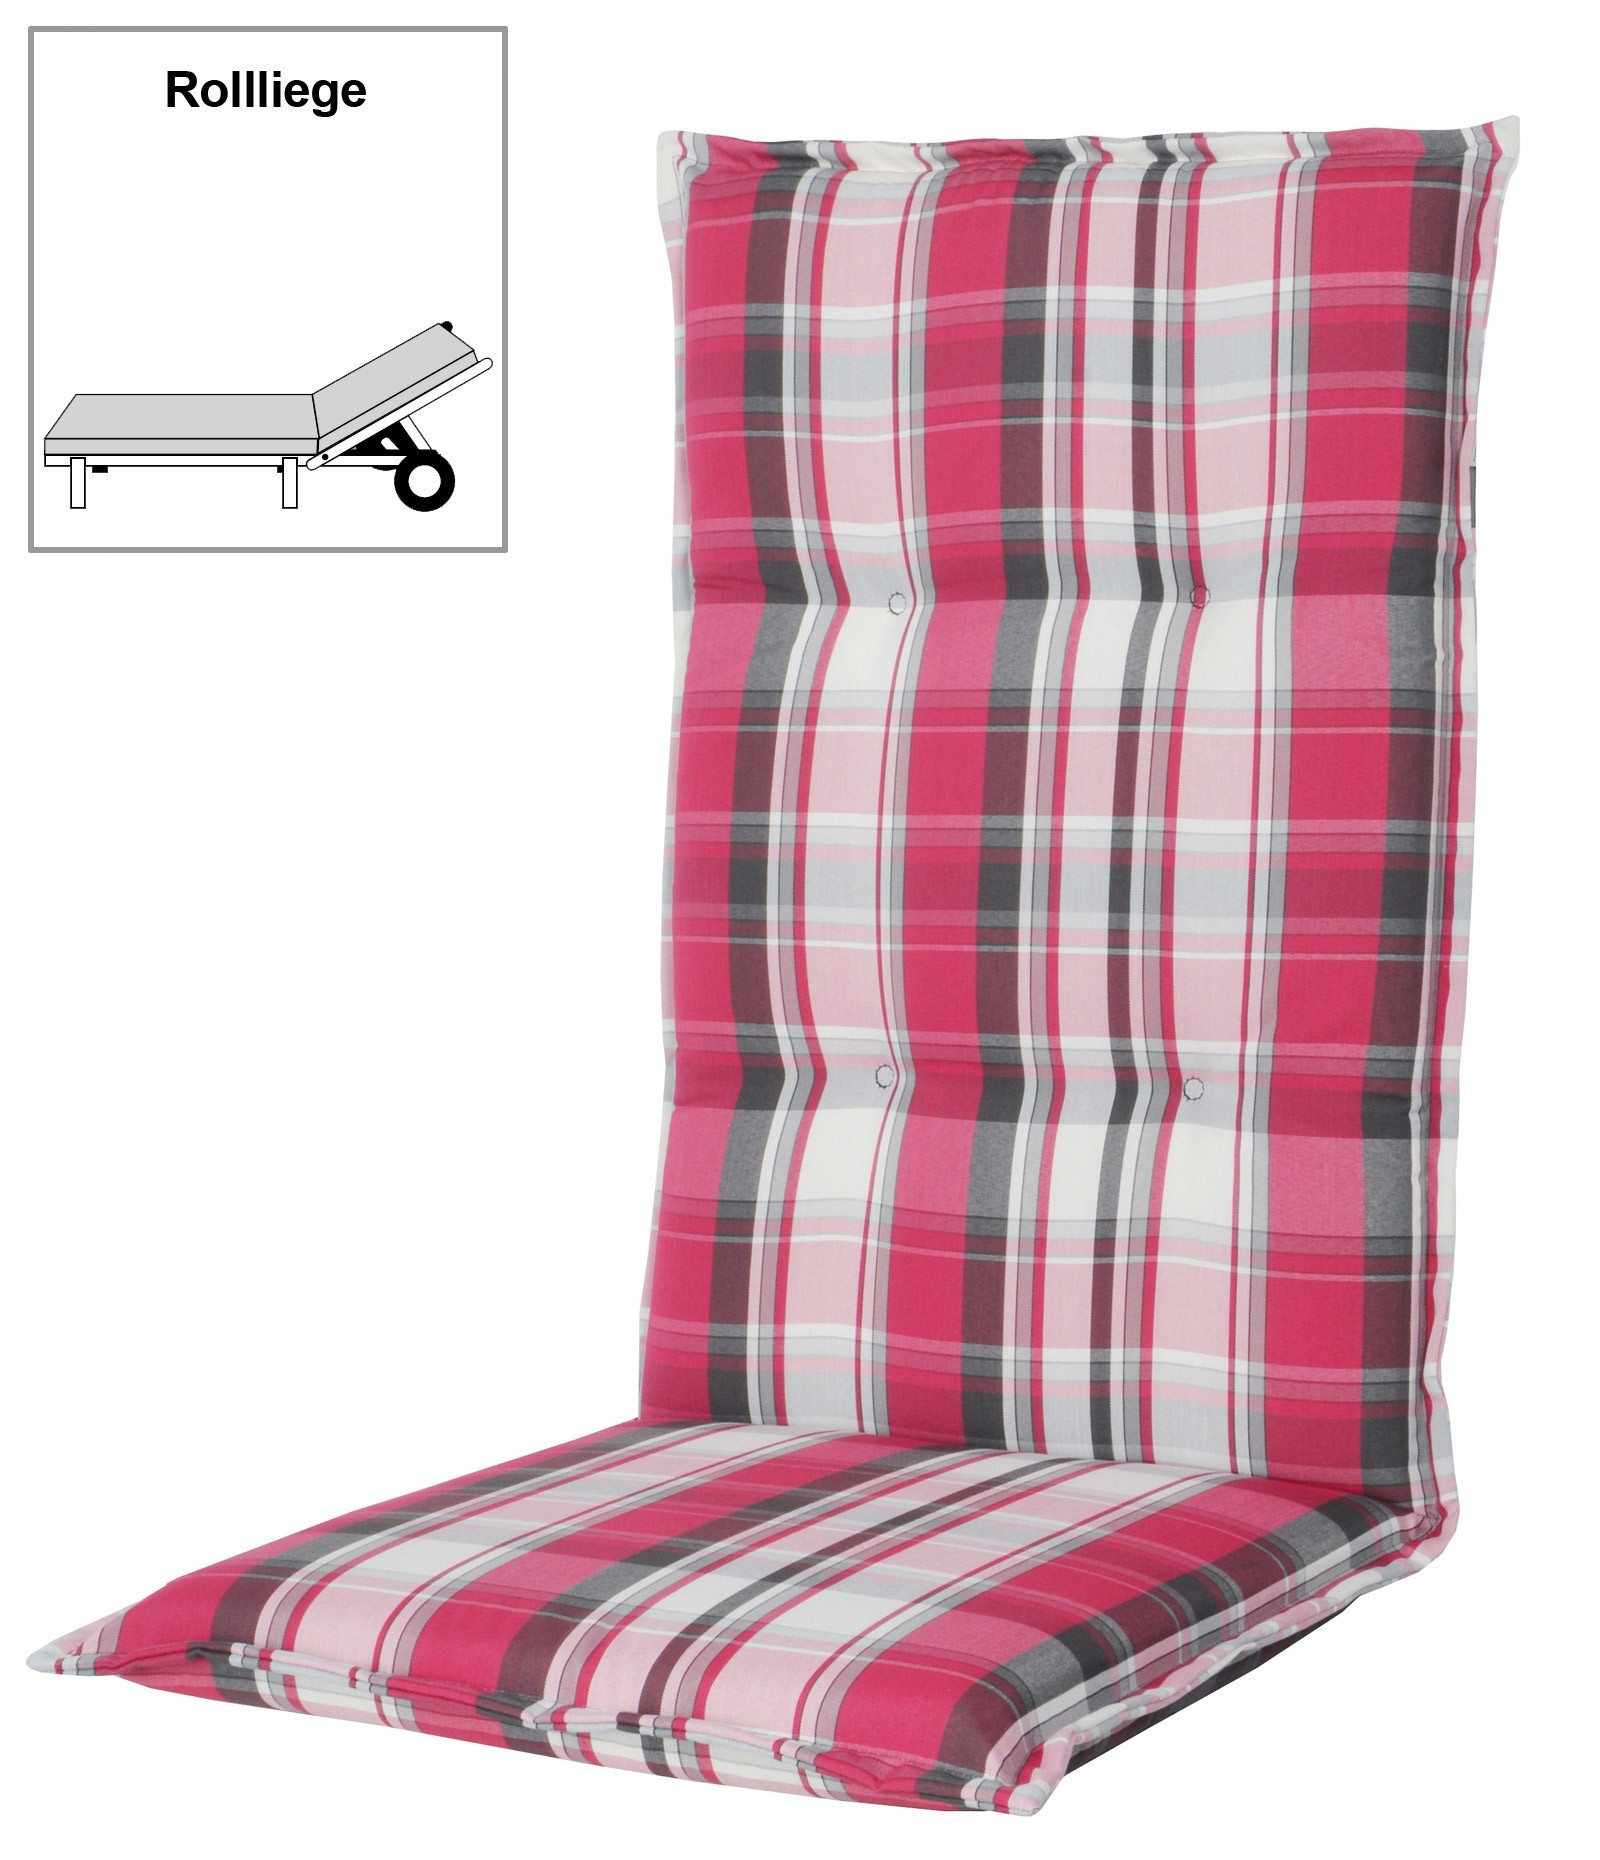 polster auflage f r gartenm bel gartenliege comfort d 5317 bei. Black Bedroom Furniture Sets. Home Design Ideas